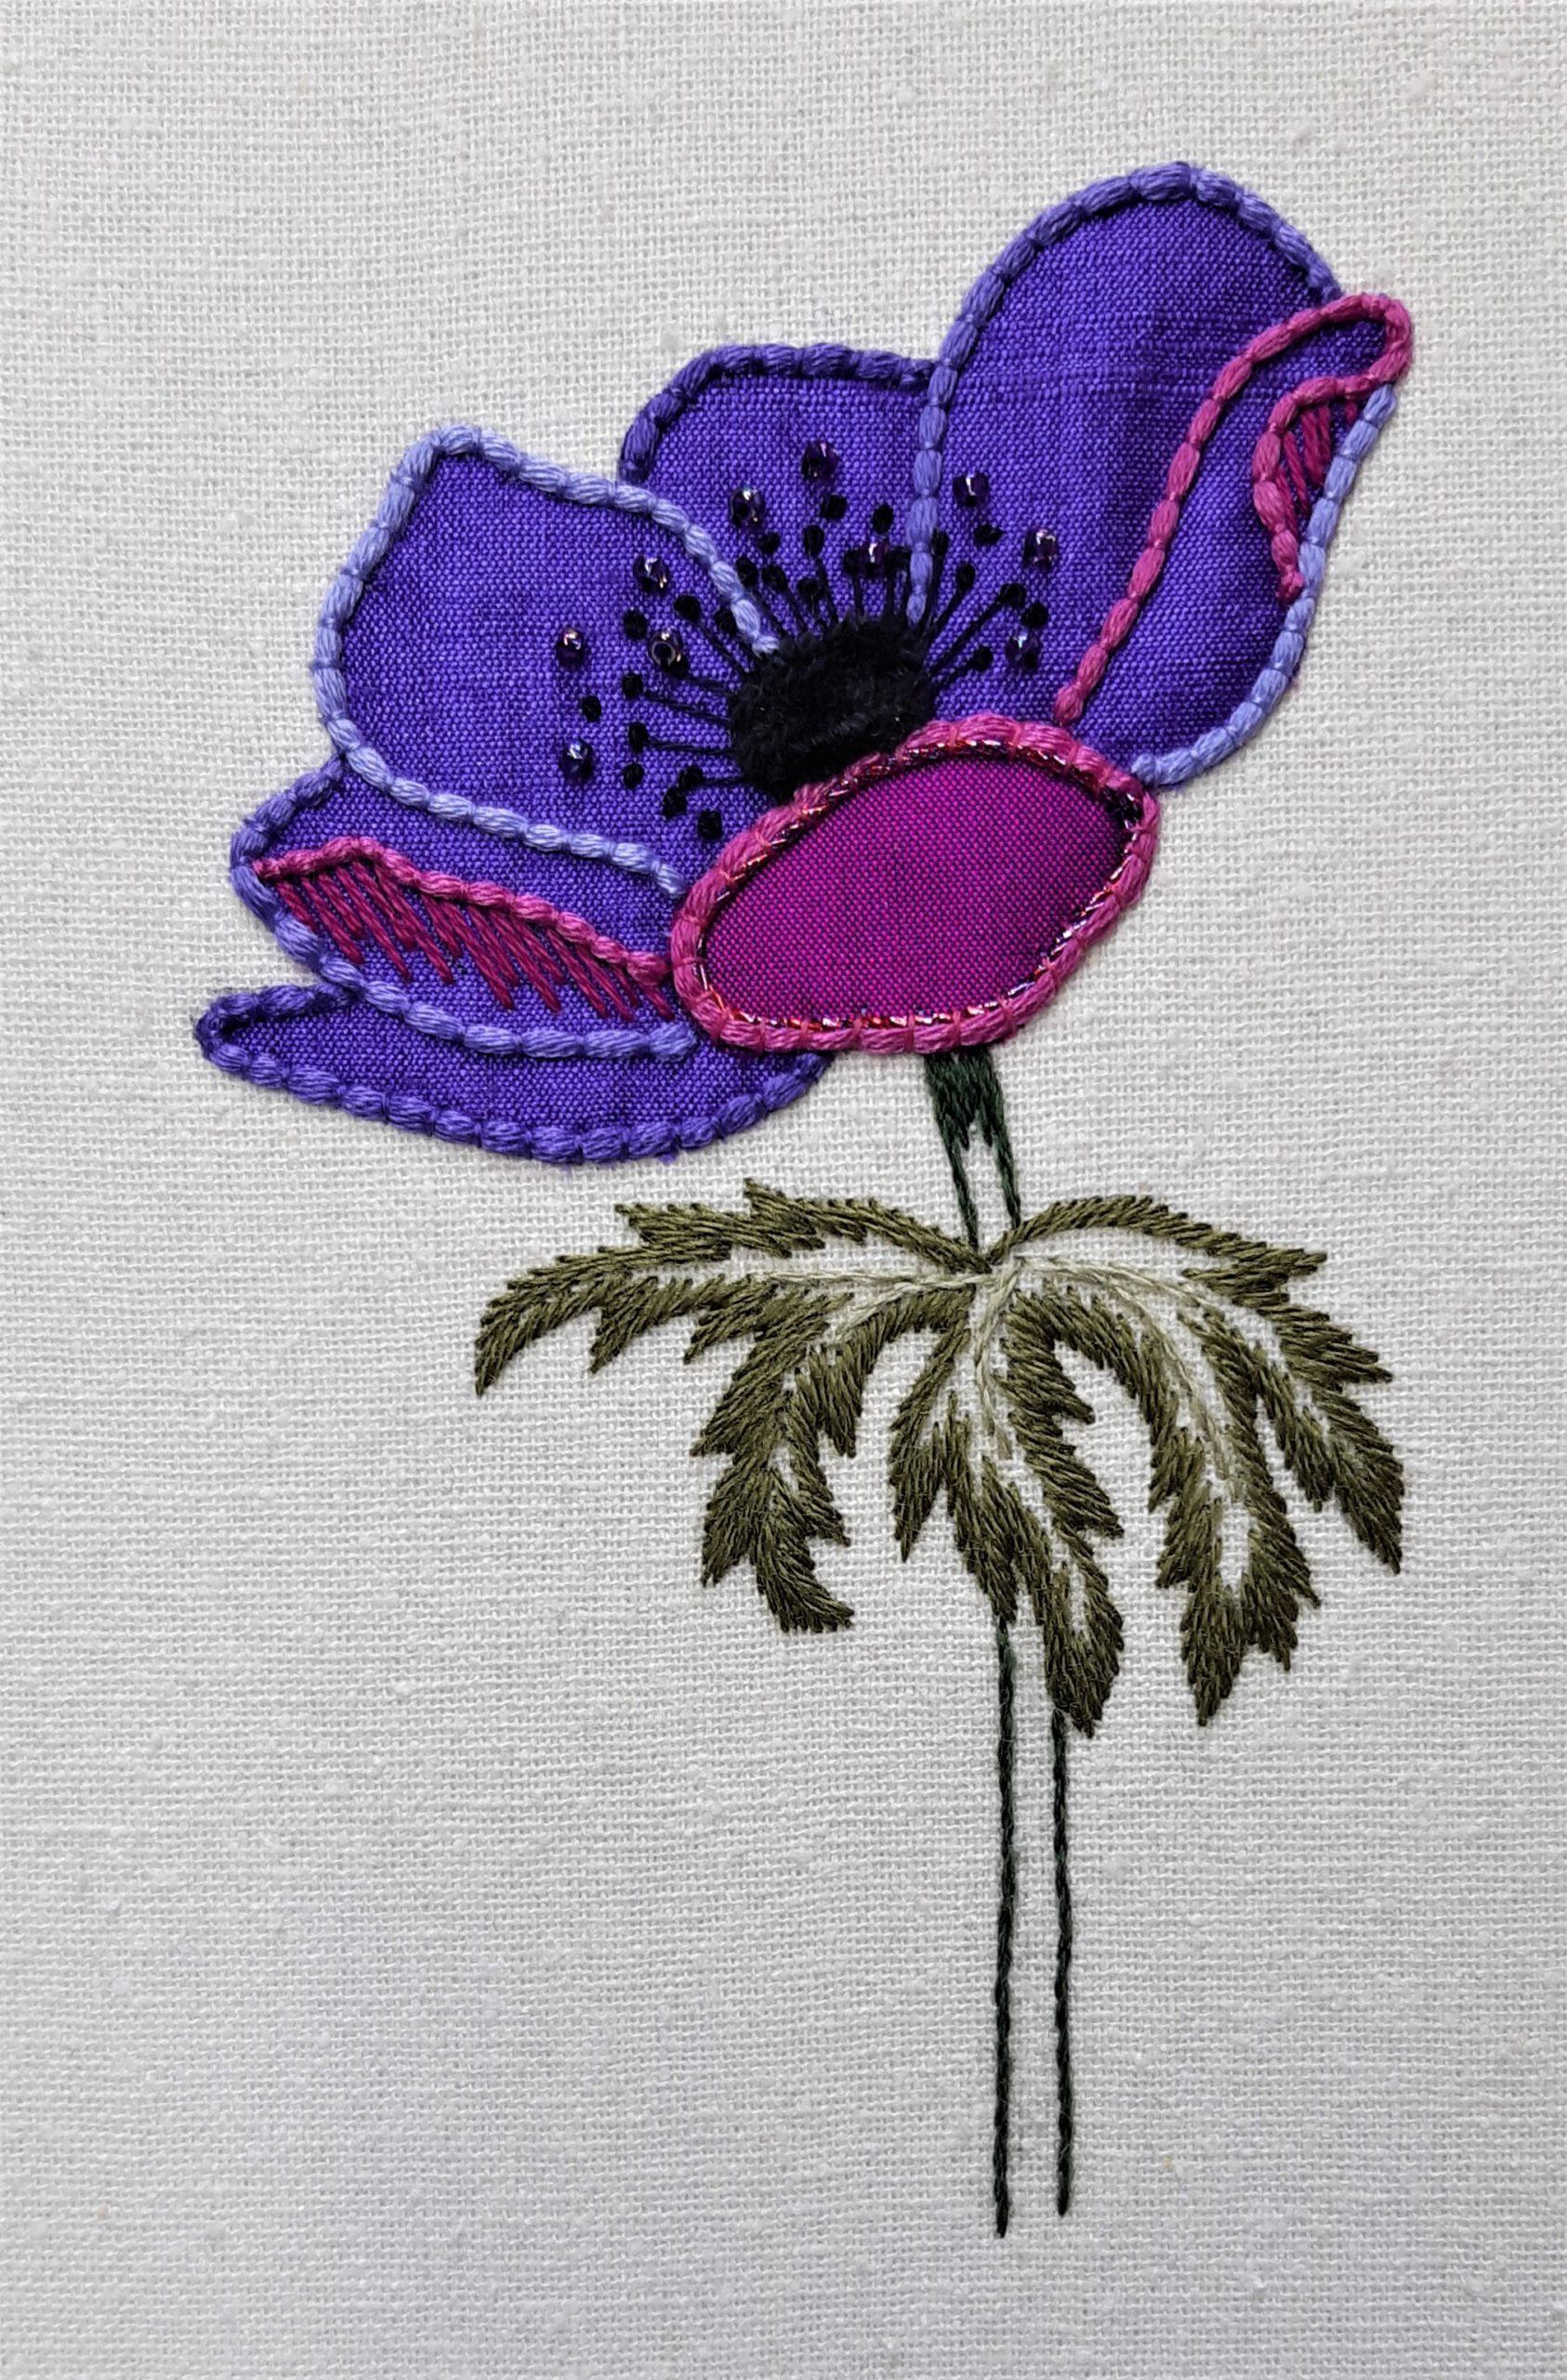 Appliqué Anemone de Caen embroidery class